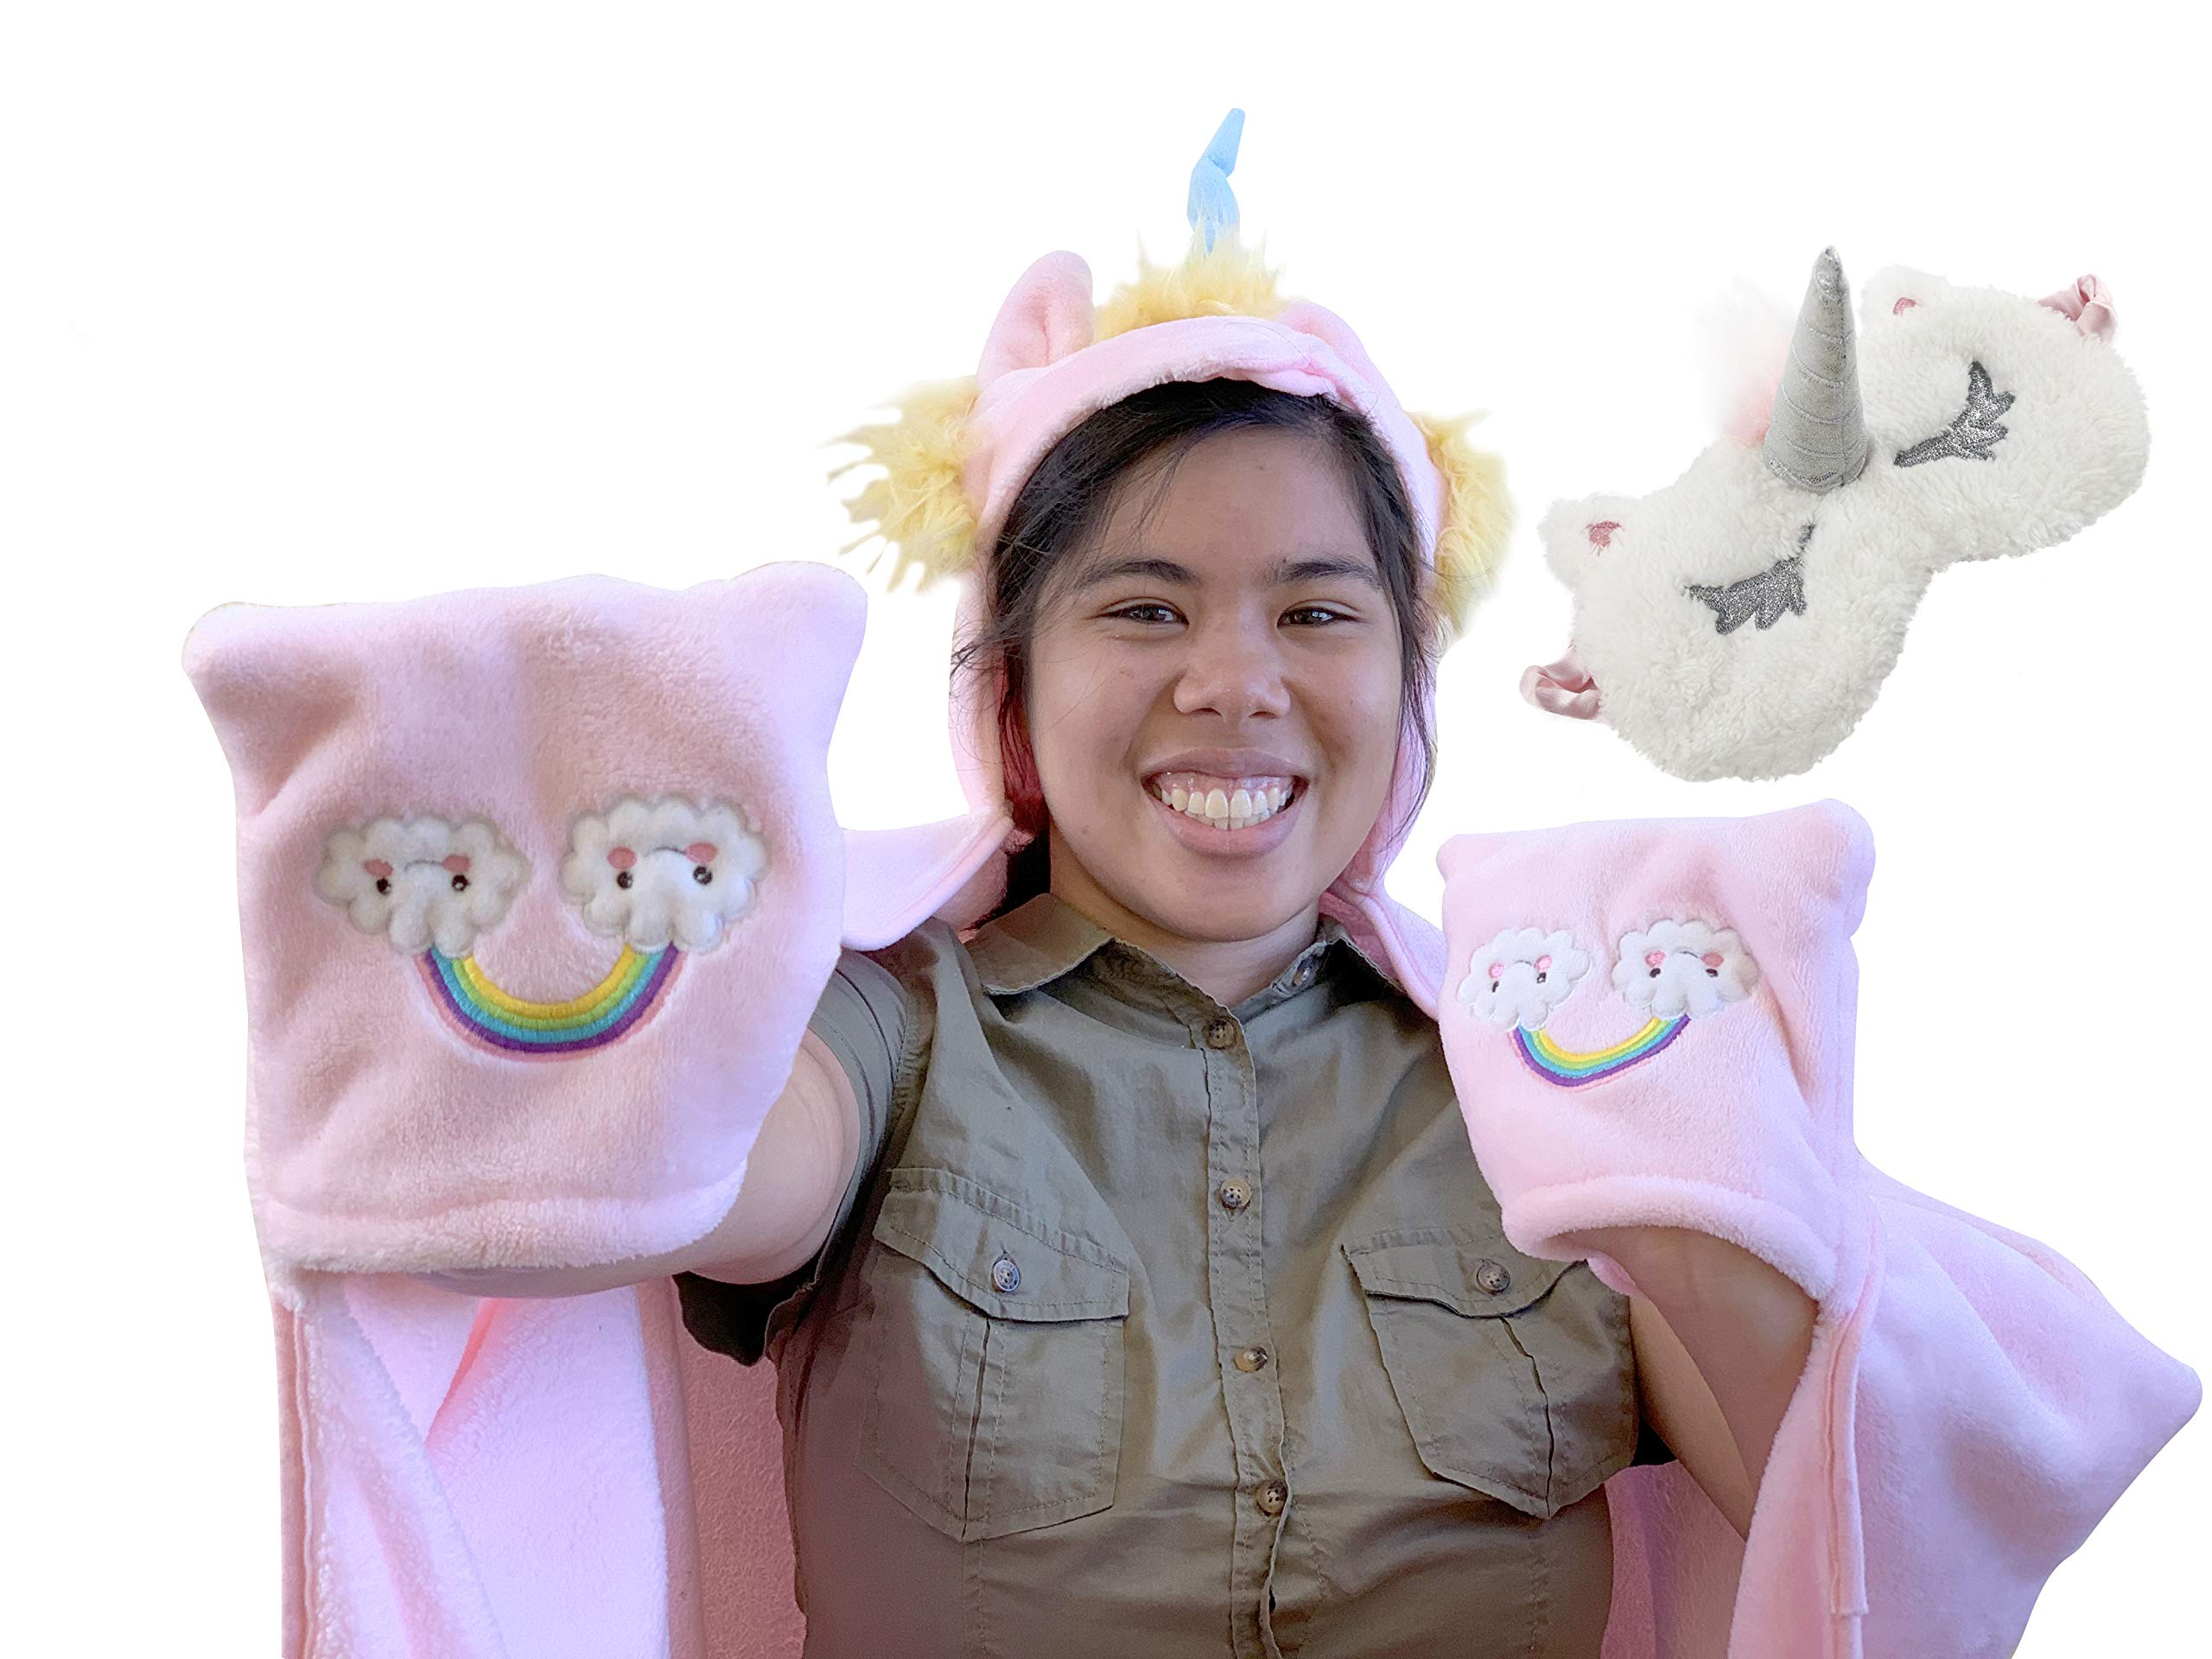 Aloha Cozy Unicorn Blanket for Girls | Unicorn Throw Blanket for Girls Set | Unicorn Eye Mask and Unicorn Hoodie for Girls | Smooth and Soft | Premium Quality | Best for Gift by Aloha Cozy